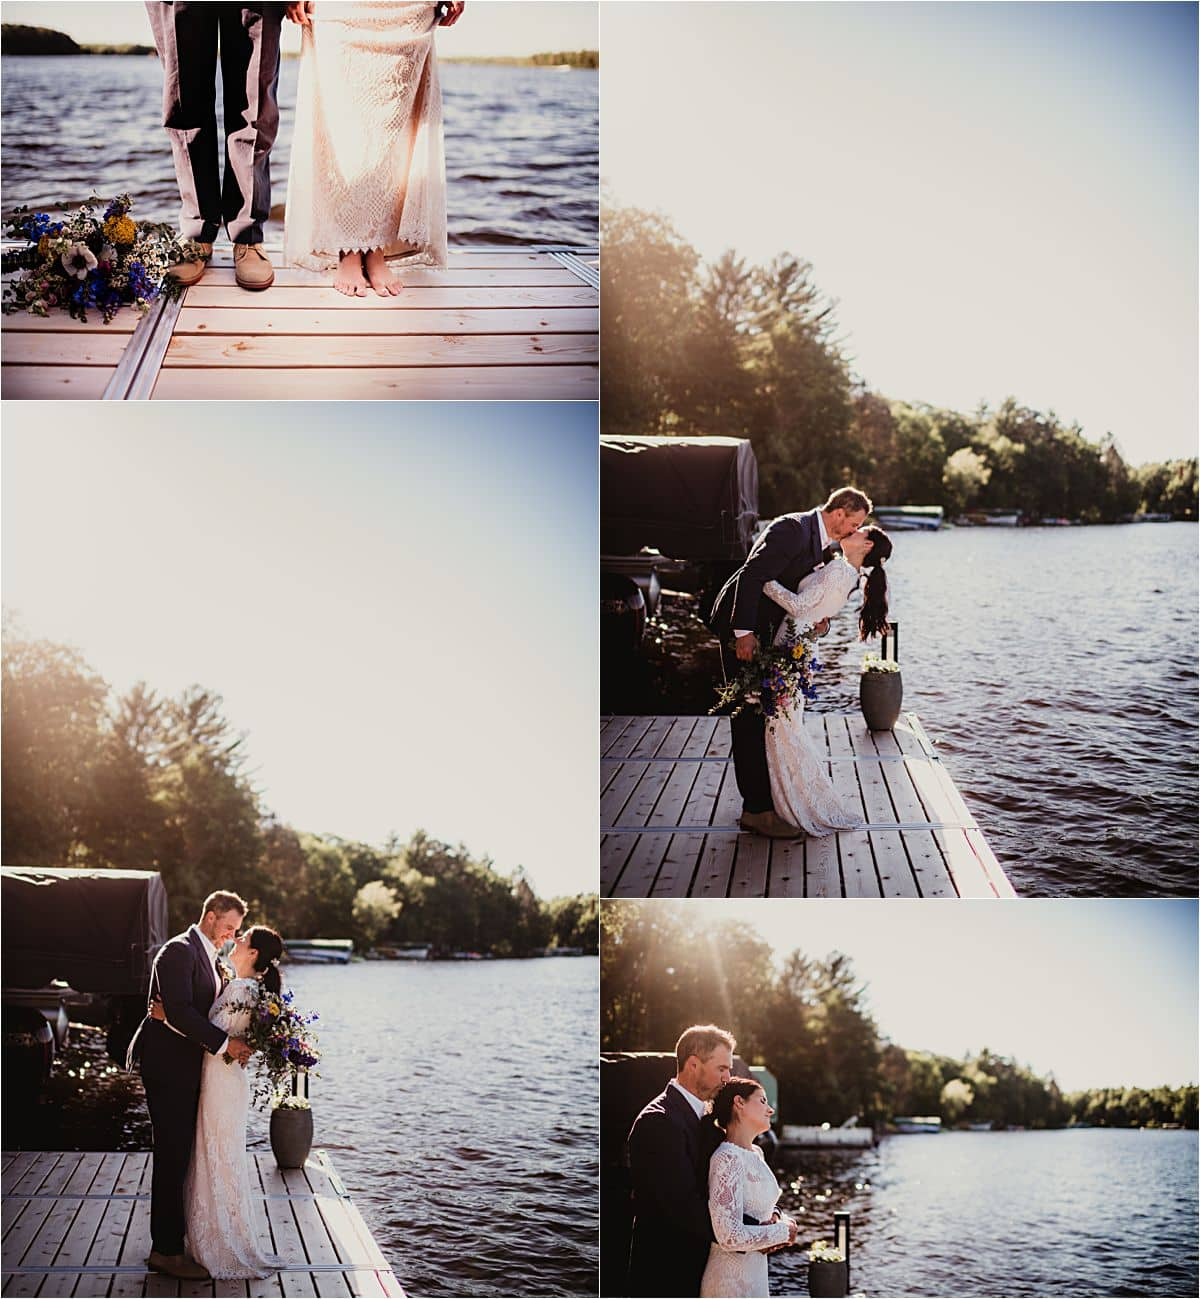 Northwoods Lakefront Summer Wedding Couple on Pier at Sunset